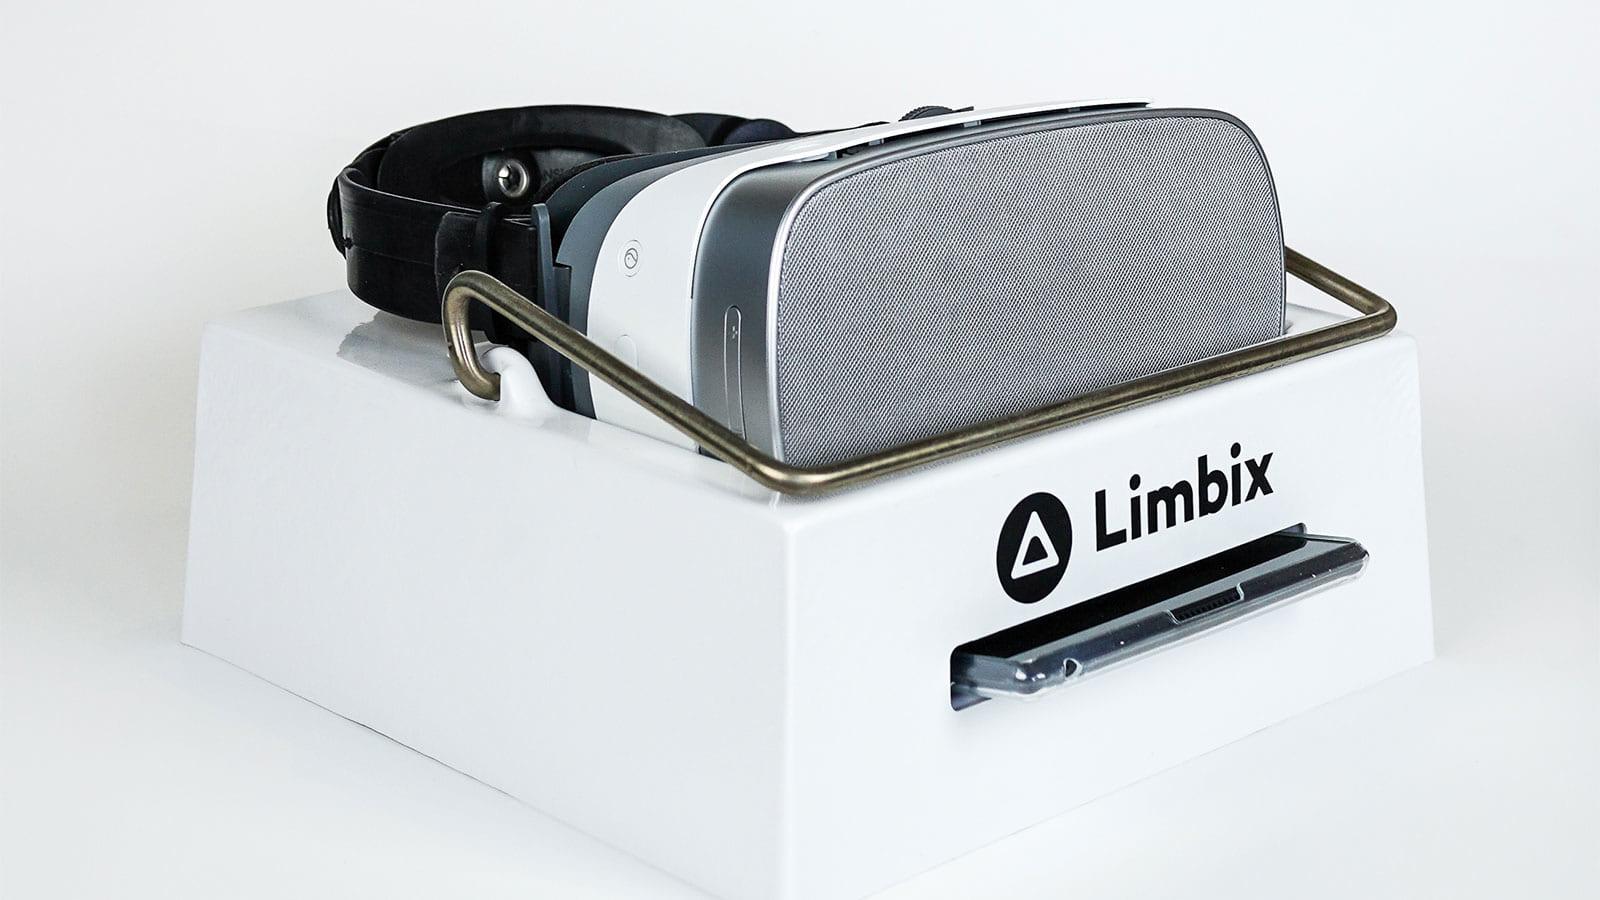 VRキットとデジタル治療アプリで患者を助けるLimbix